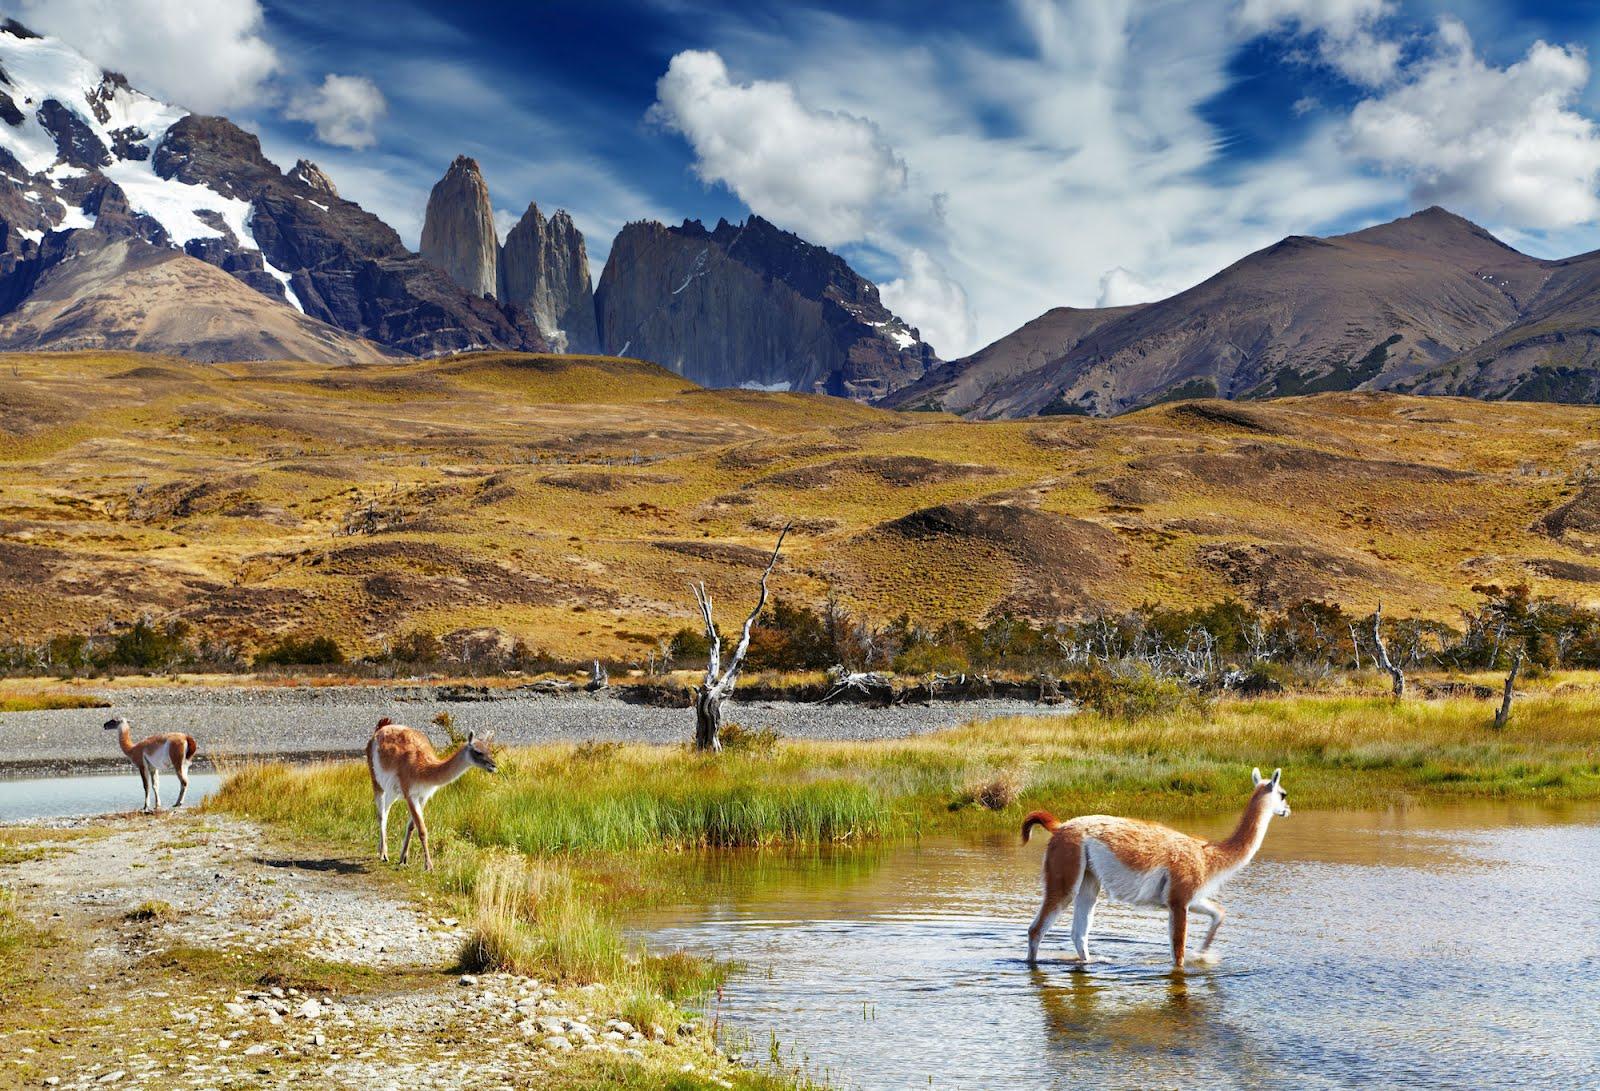 patagonia chile llamas alpacas vicu as and guanacos. Black Bedroom Furniture Sets. Home Design Ideas